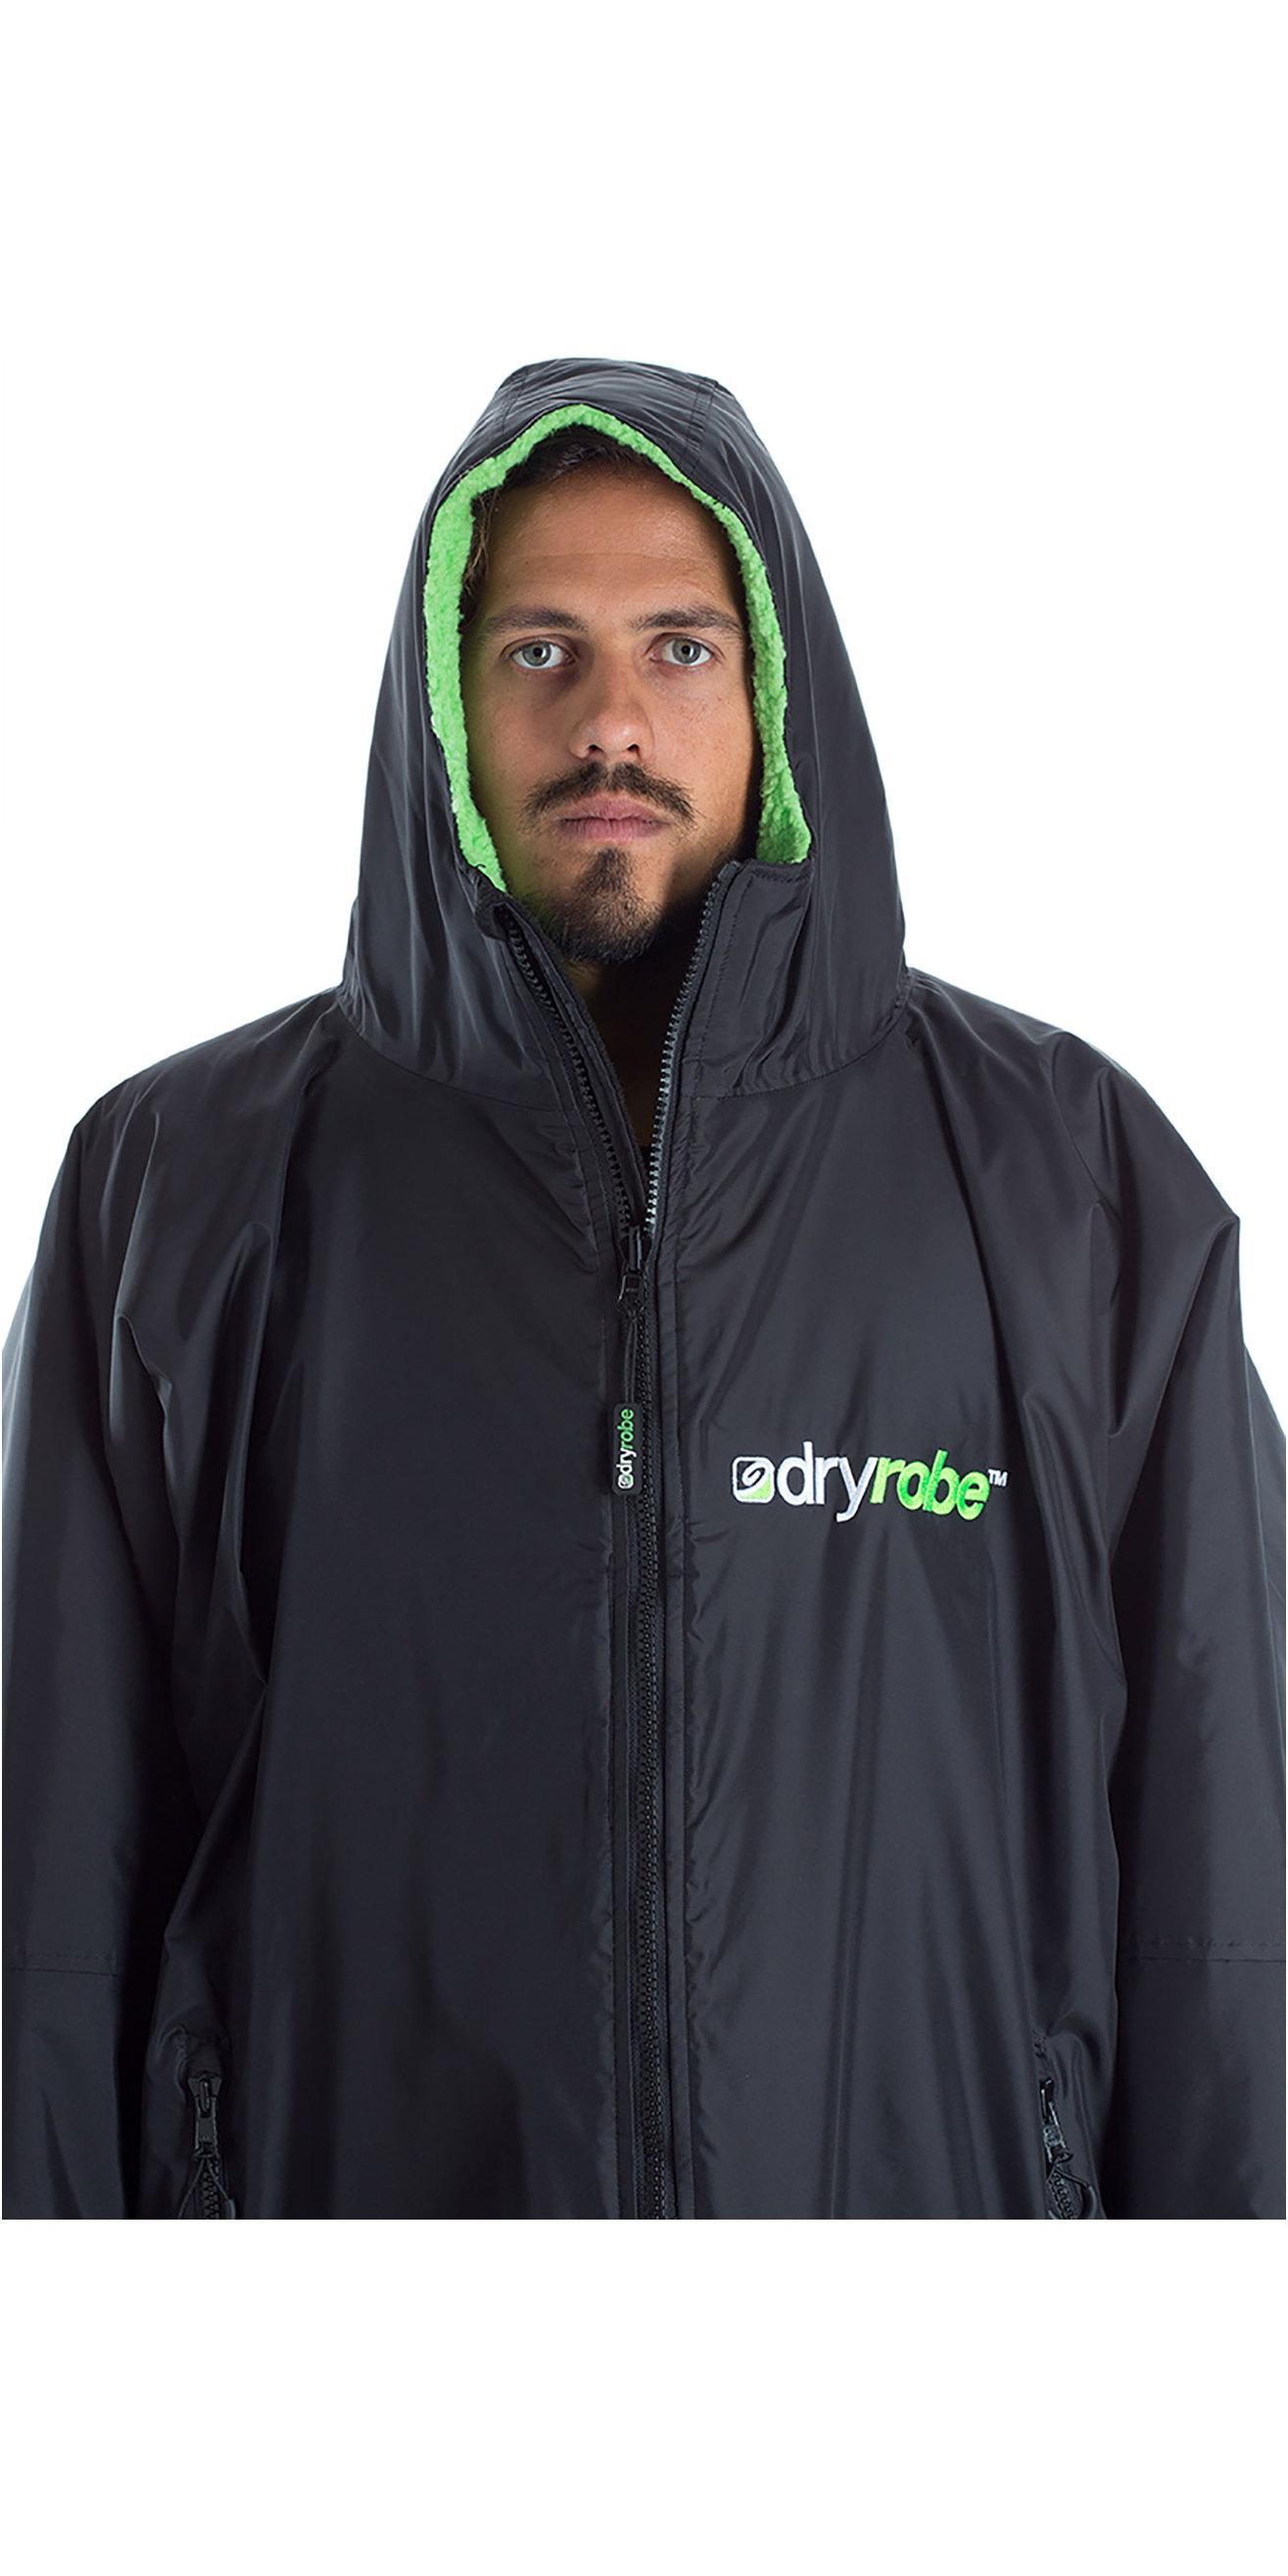 2019 Dryrobe Advance Short Sleeve Premium Outdoor Change Robe / Poncho DR100 Black / Green